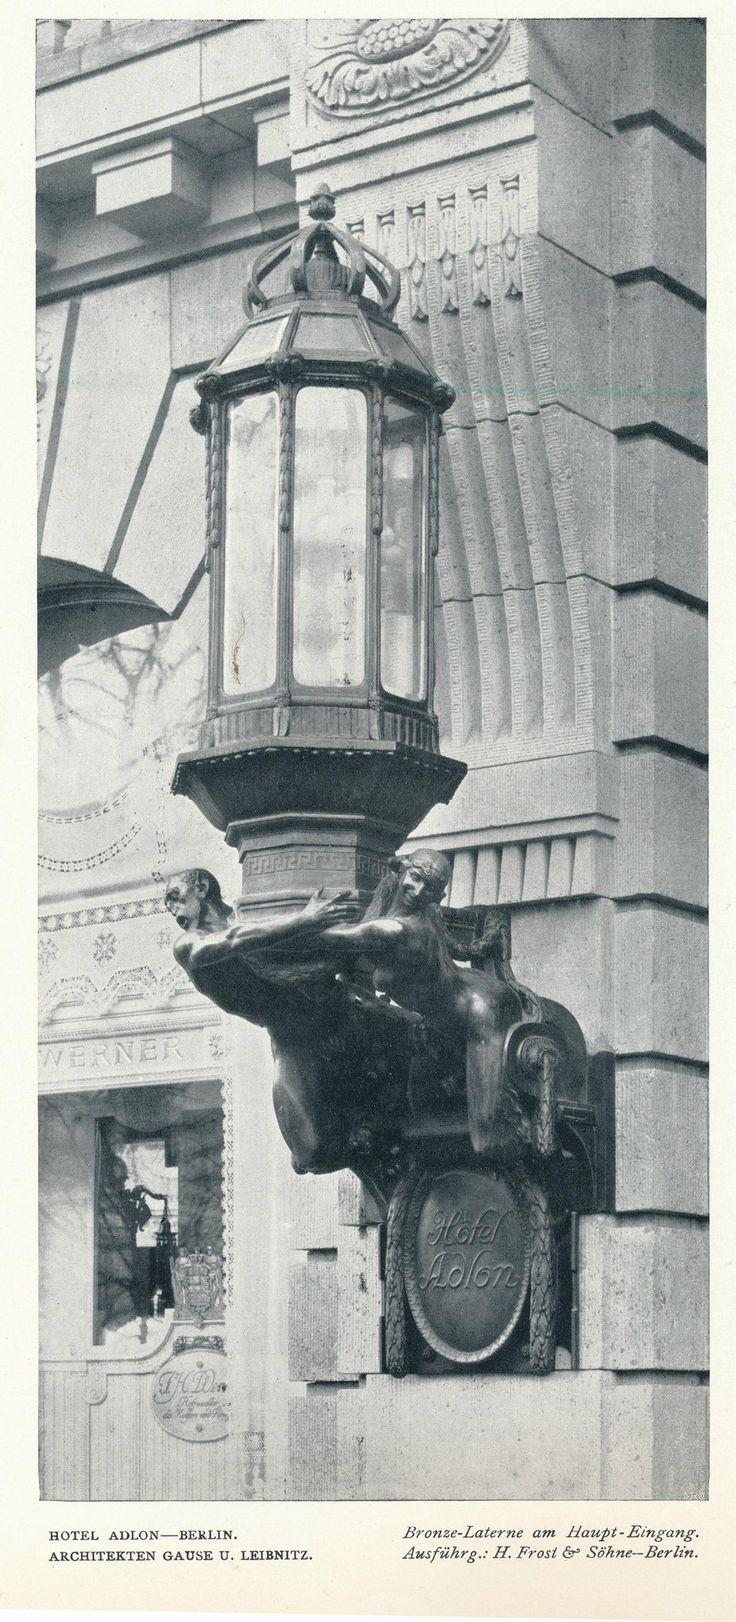 https://flic.kr/p/yf3Ggn   Innendecoration 1908 Berlin Hotel Adlon  c cc